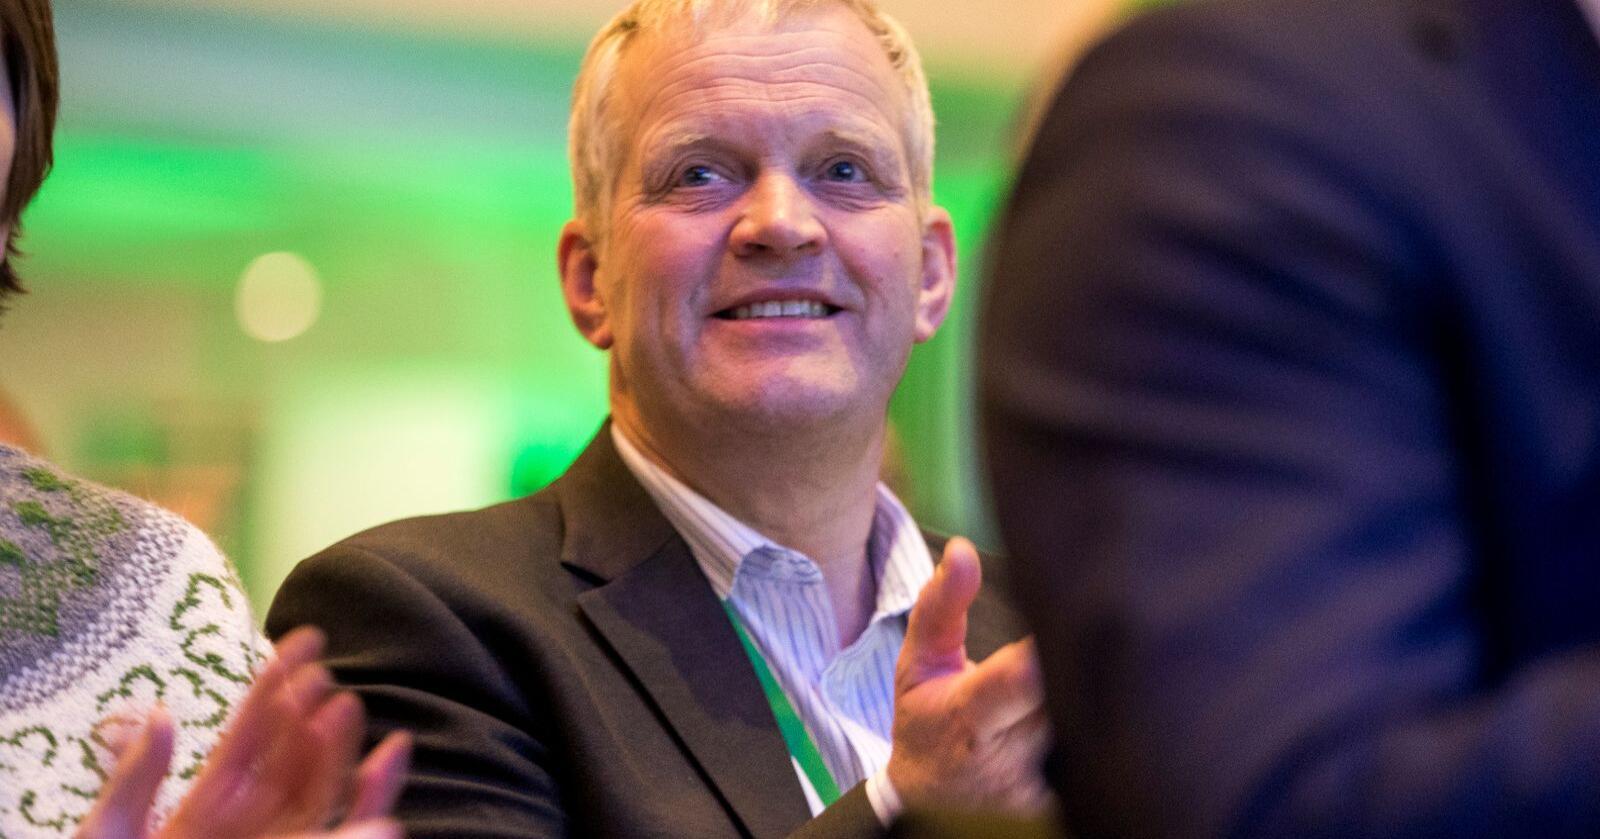 Stortingsrepresentant Nils T. Bjørke (Sp) var leiar i Norges Bondelag i 2014. Han meiner dagens økonomiske problem for bønder skriv seg frå endringane som då vart gjort. Foto: Terje Pedersen / NTB